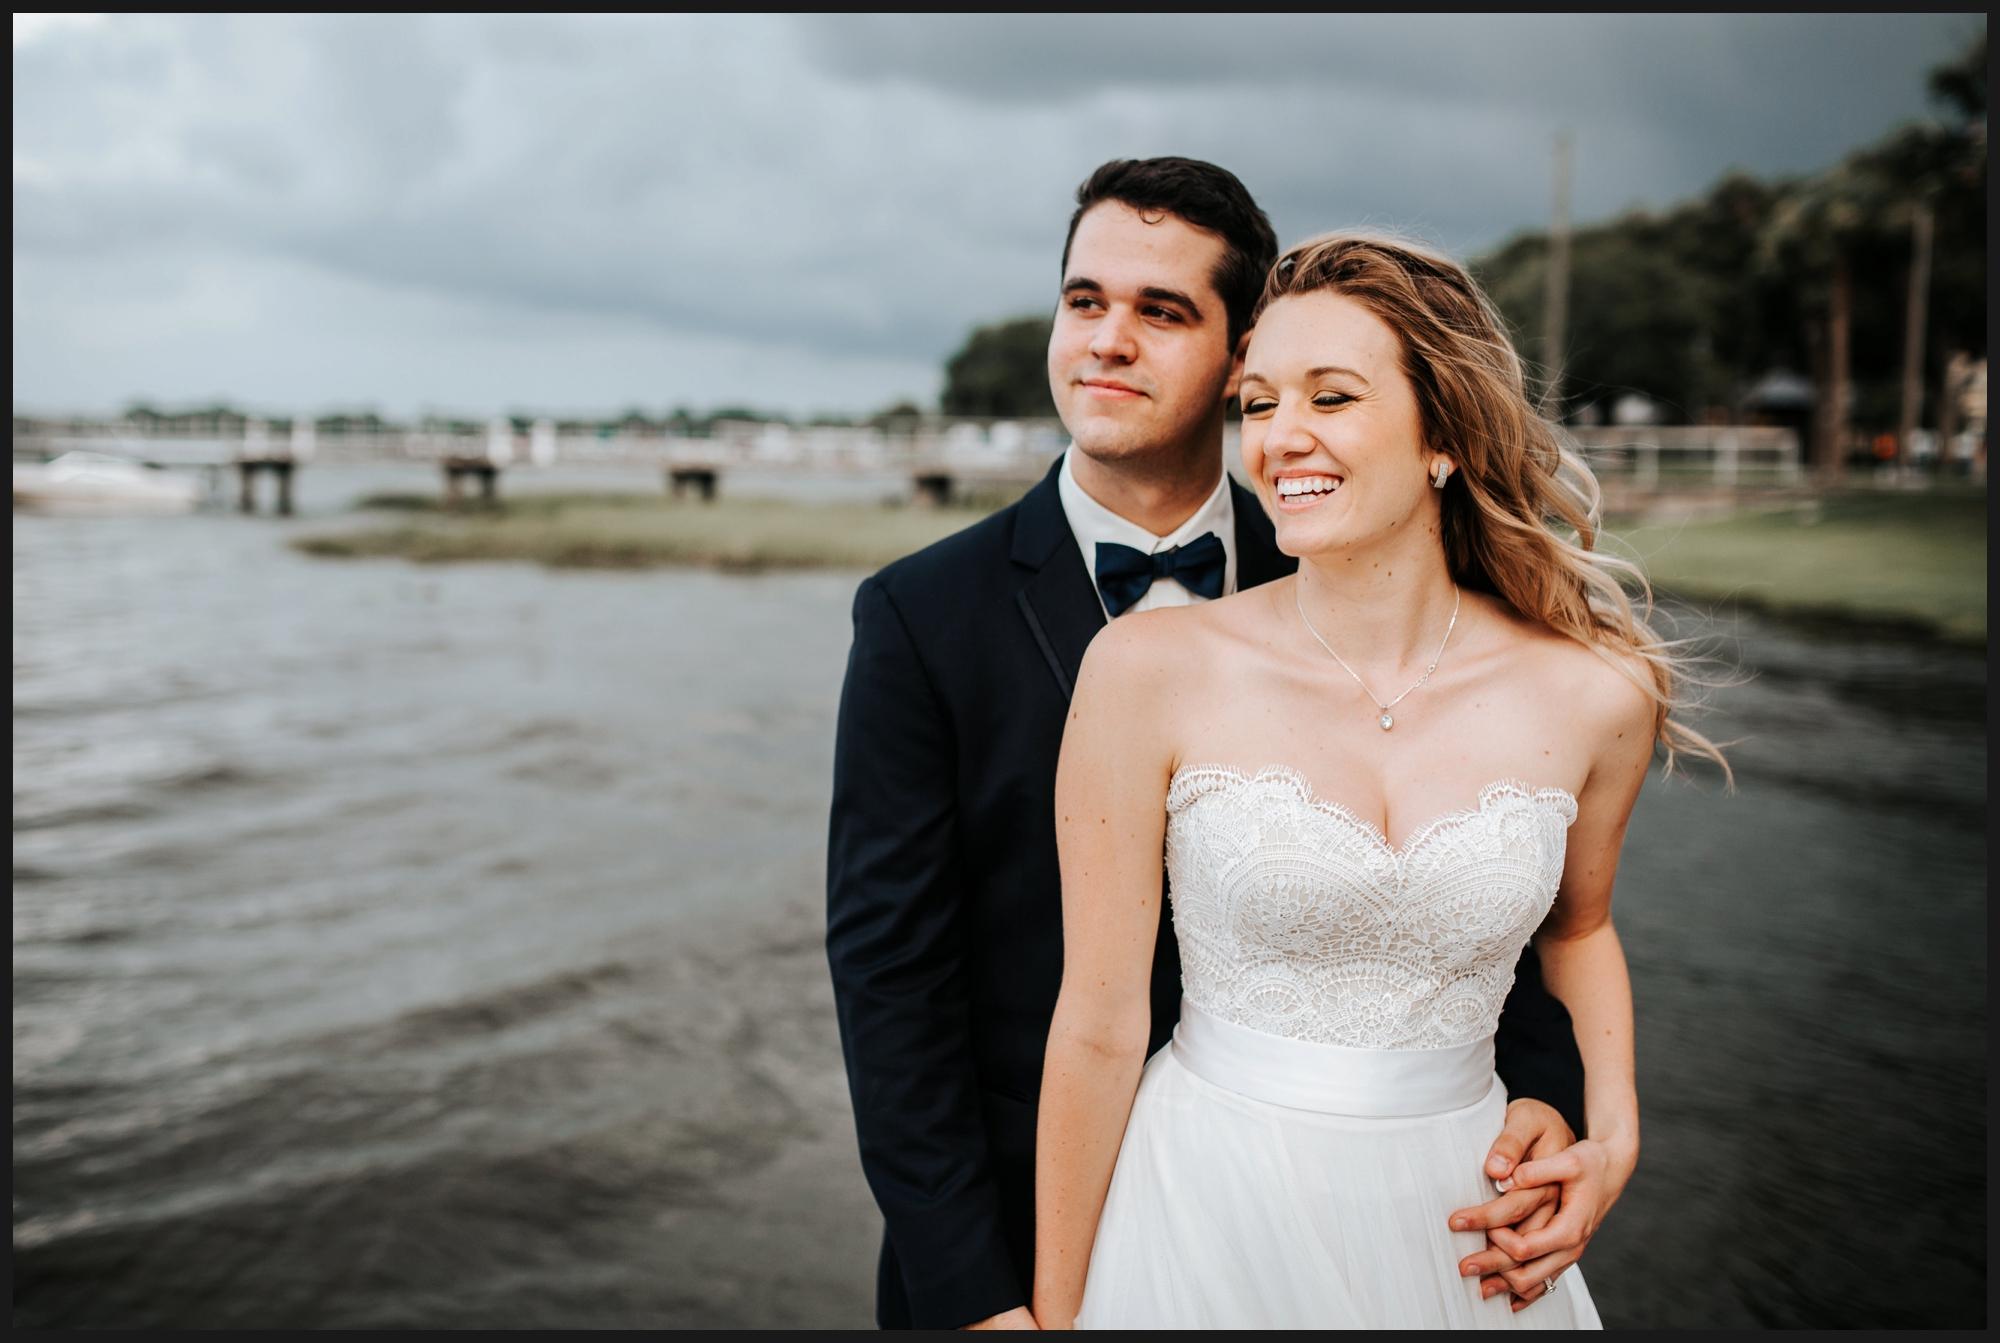 Orlando-Wedding-Photographer-destination-wedding-photographer-florida-wedding-photographer-bohemian-wedding-photographer_0305.jpg